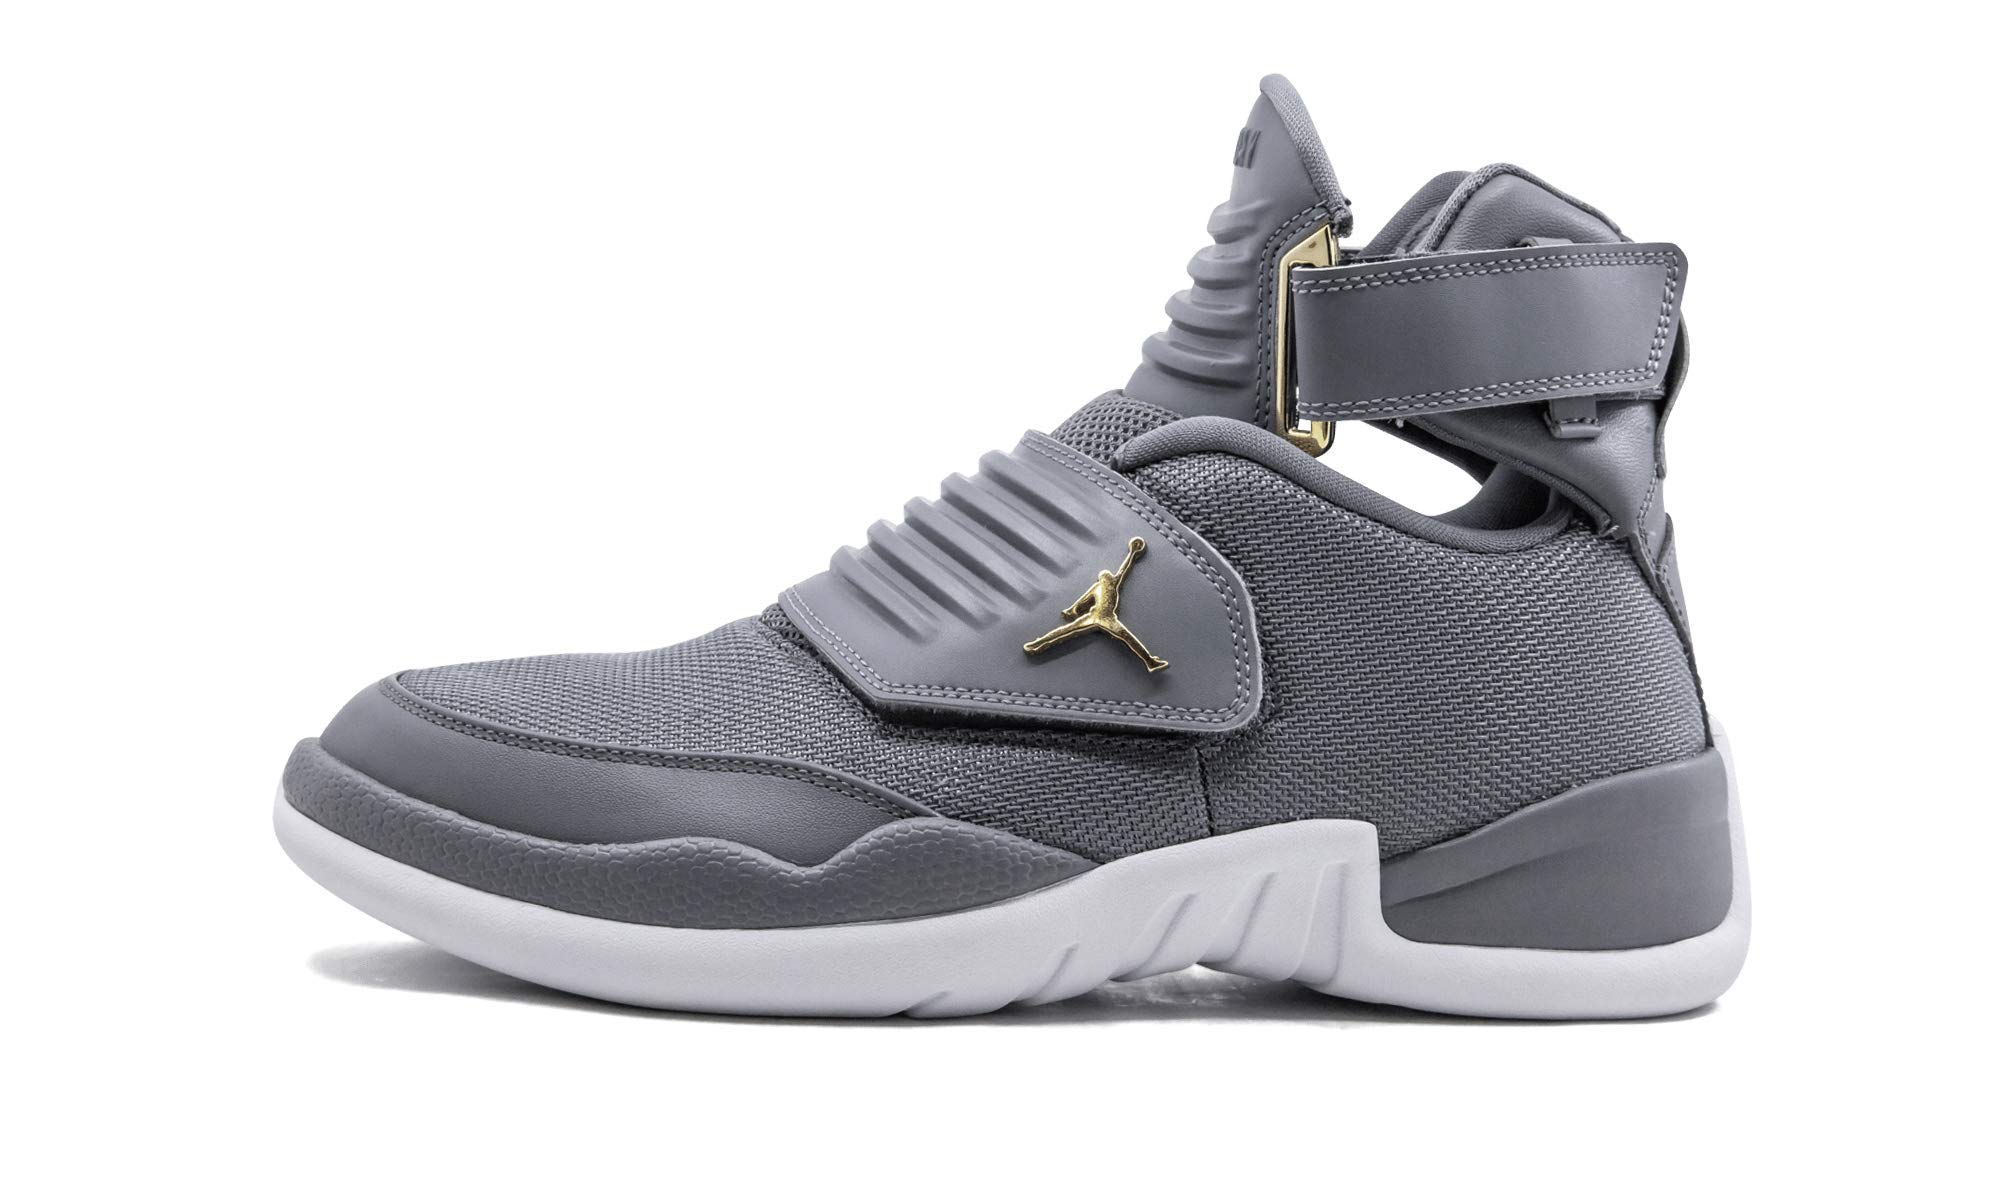 7aa24ef7737 Galleon - Nike Air Jordan Men's Generation 23 Basketball Shoes (9.5, Cool  Grey/White)